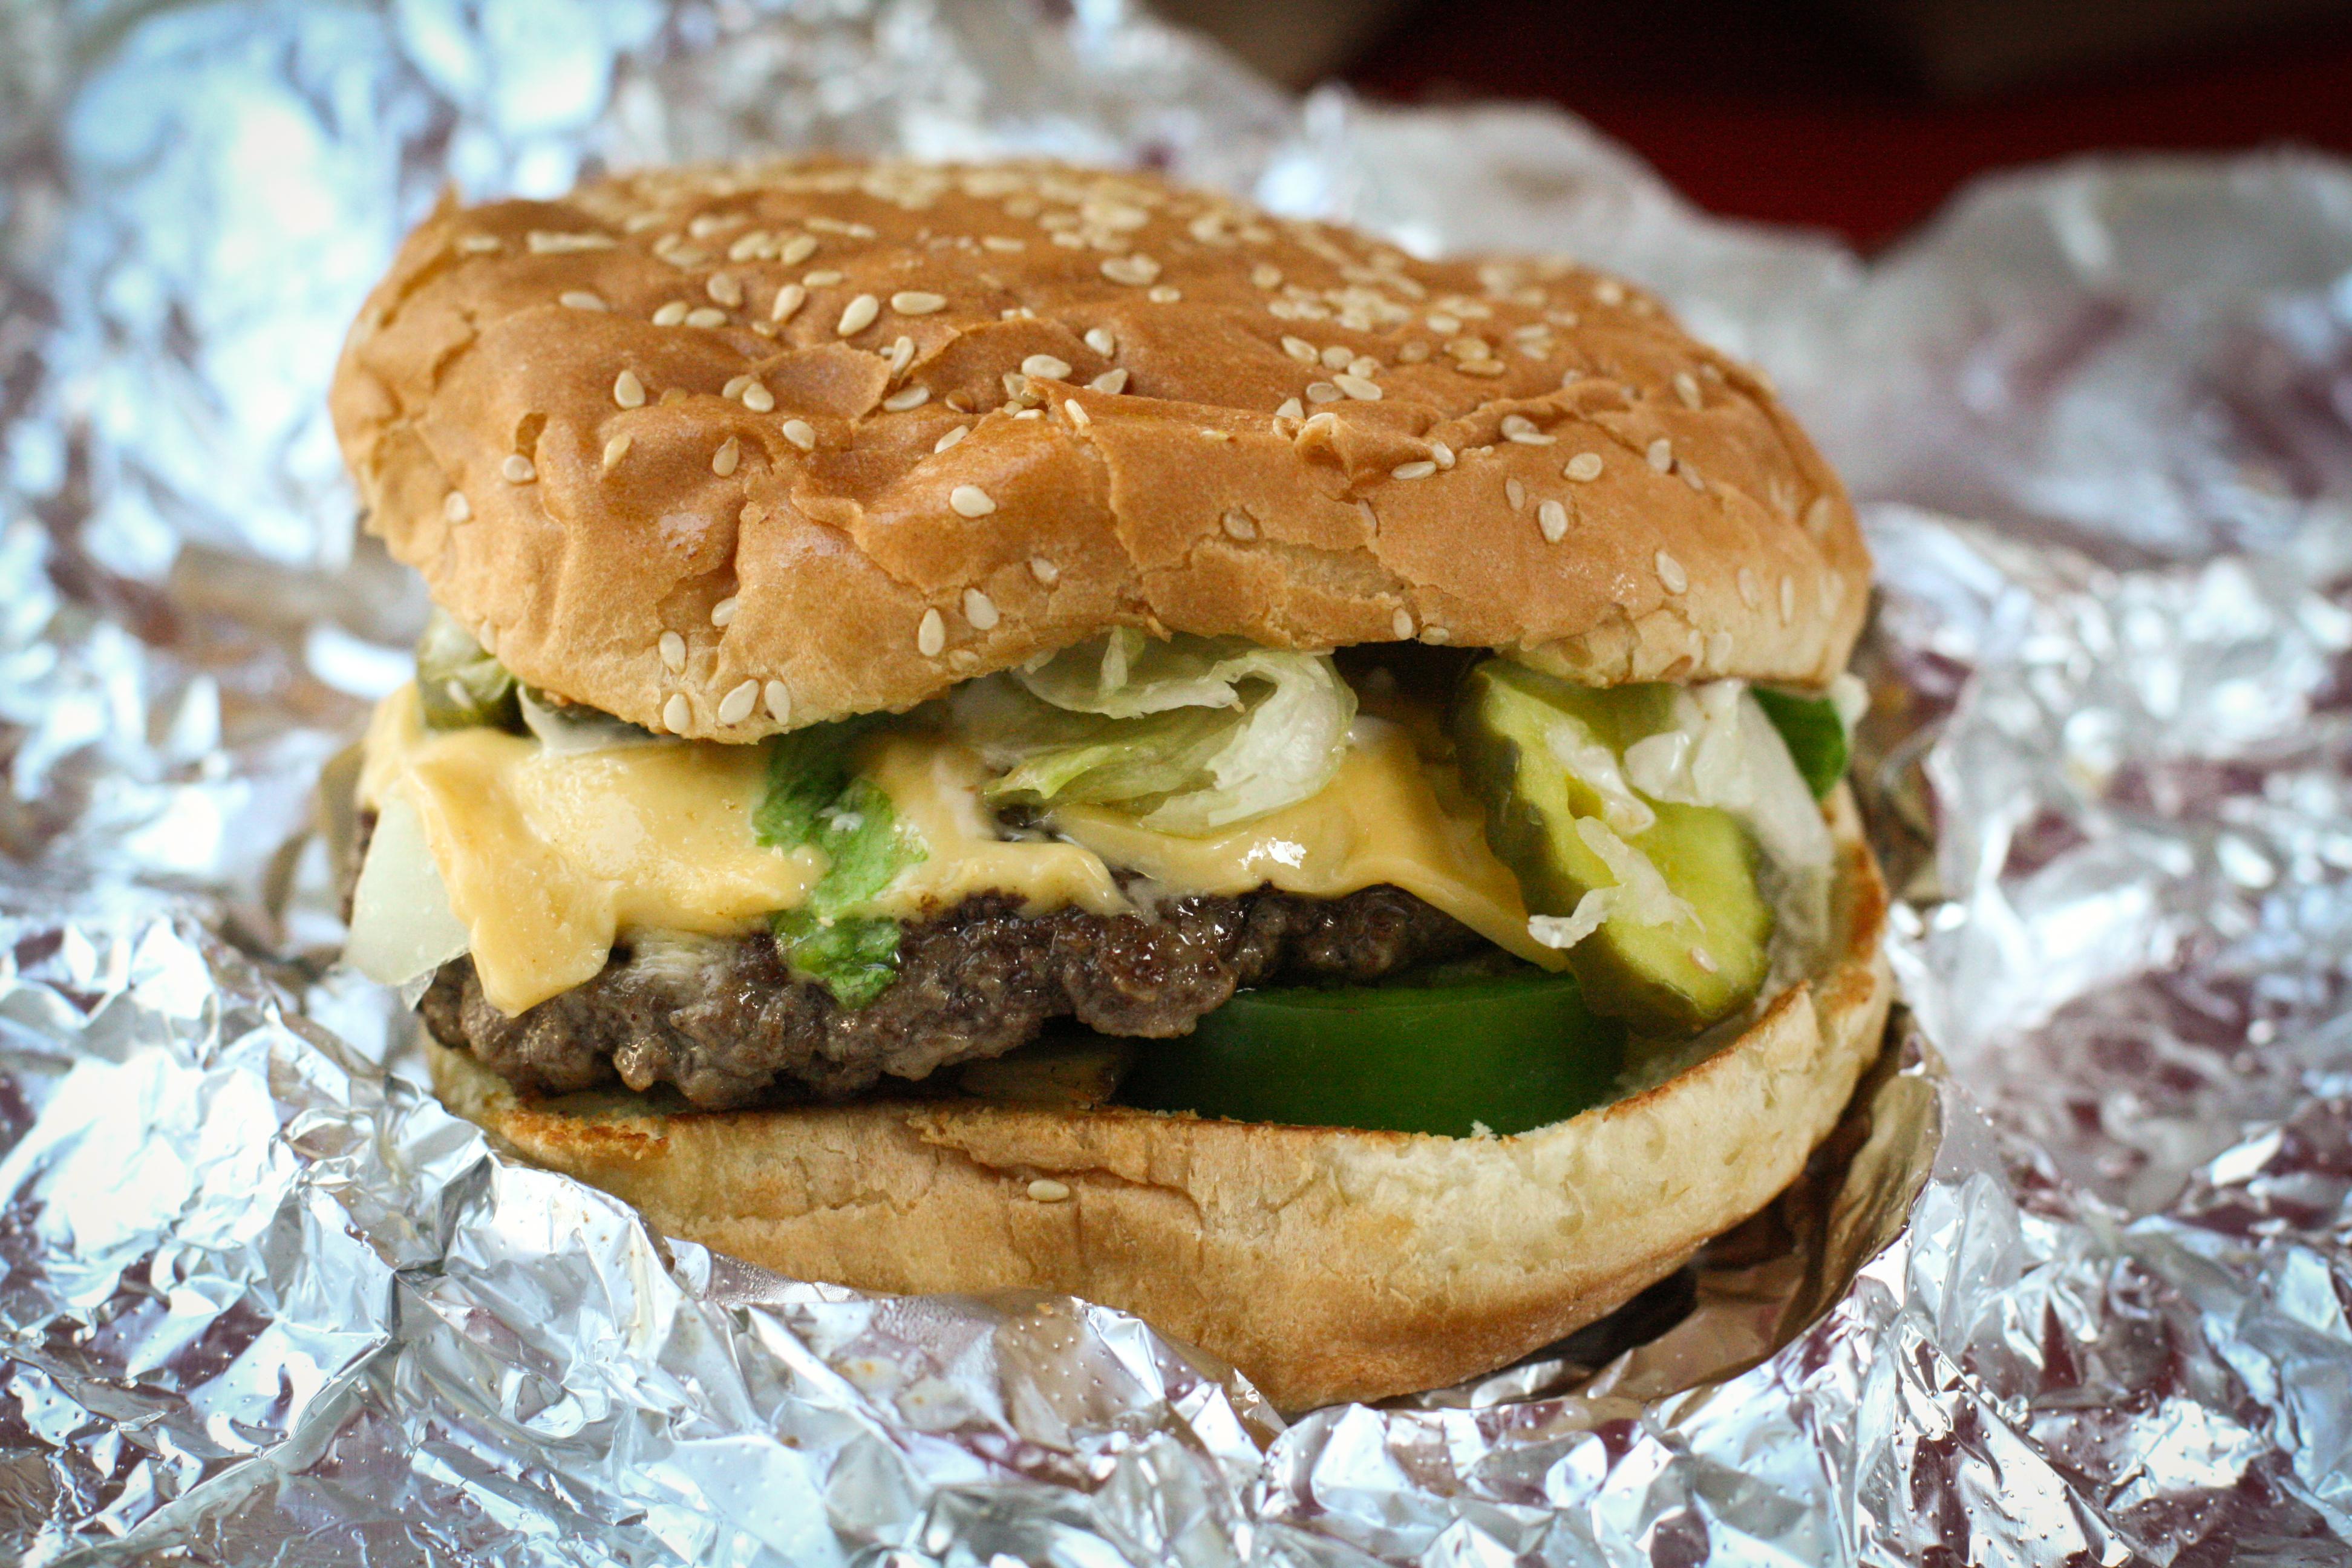 BUN BOY EATS LA – FIVE GUYS BURGERS & MY MONTH WITH CLEOPATRA